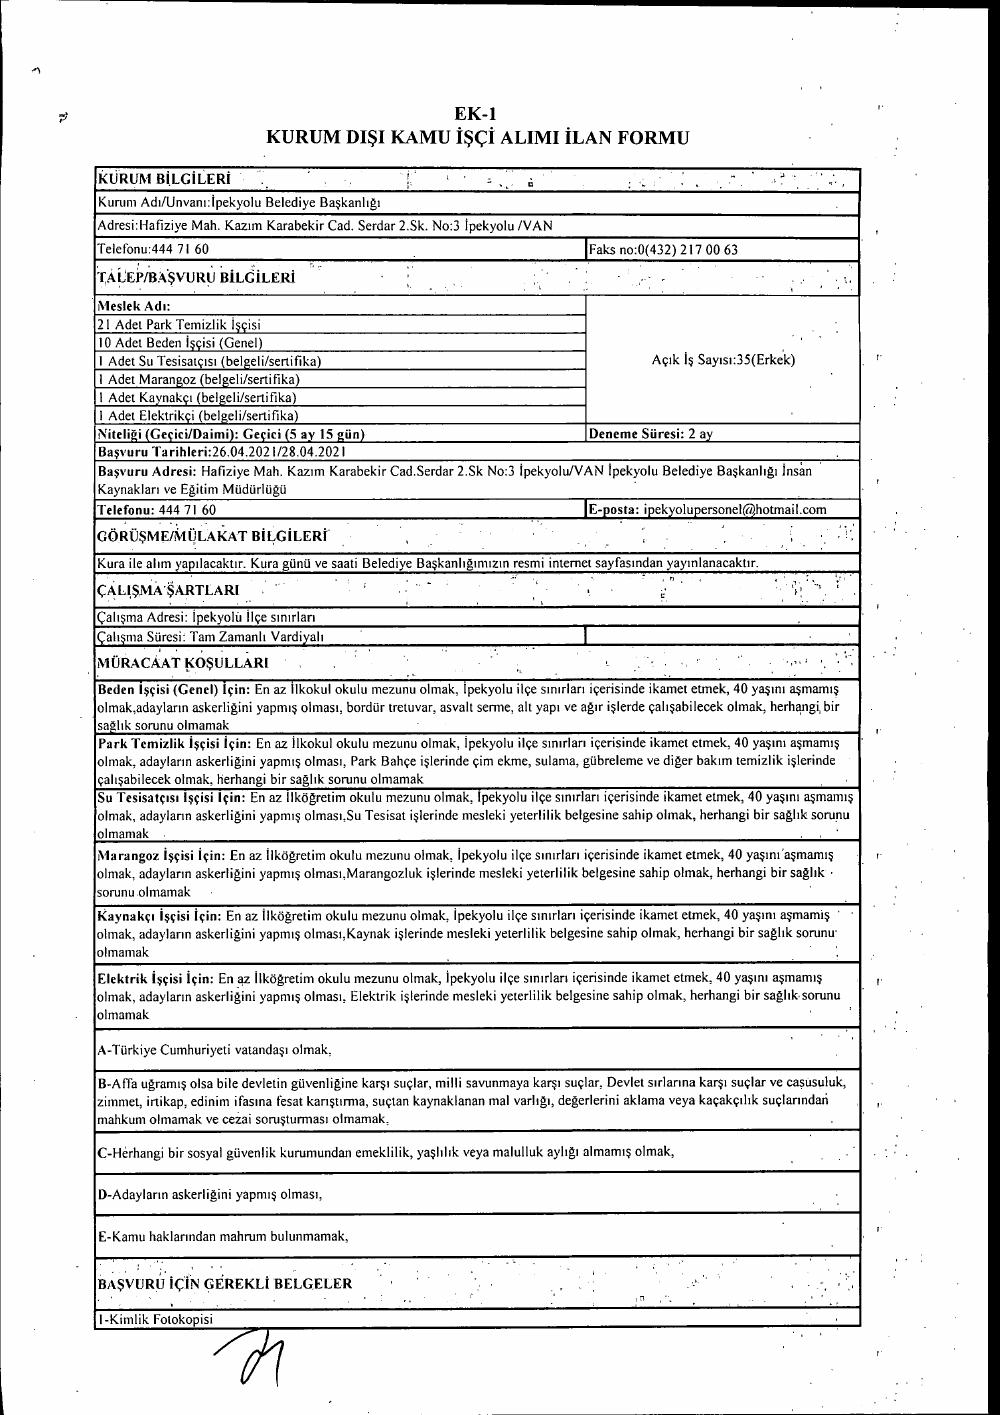 van-ipekyolu-belediye-baskanligi-28-04-2021-000001.png